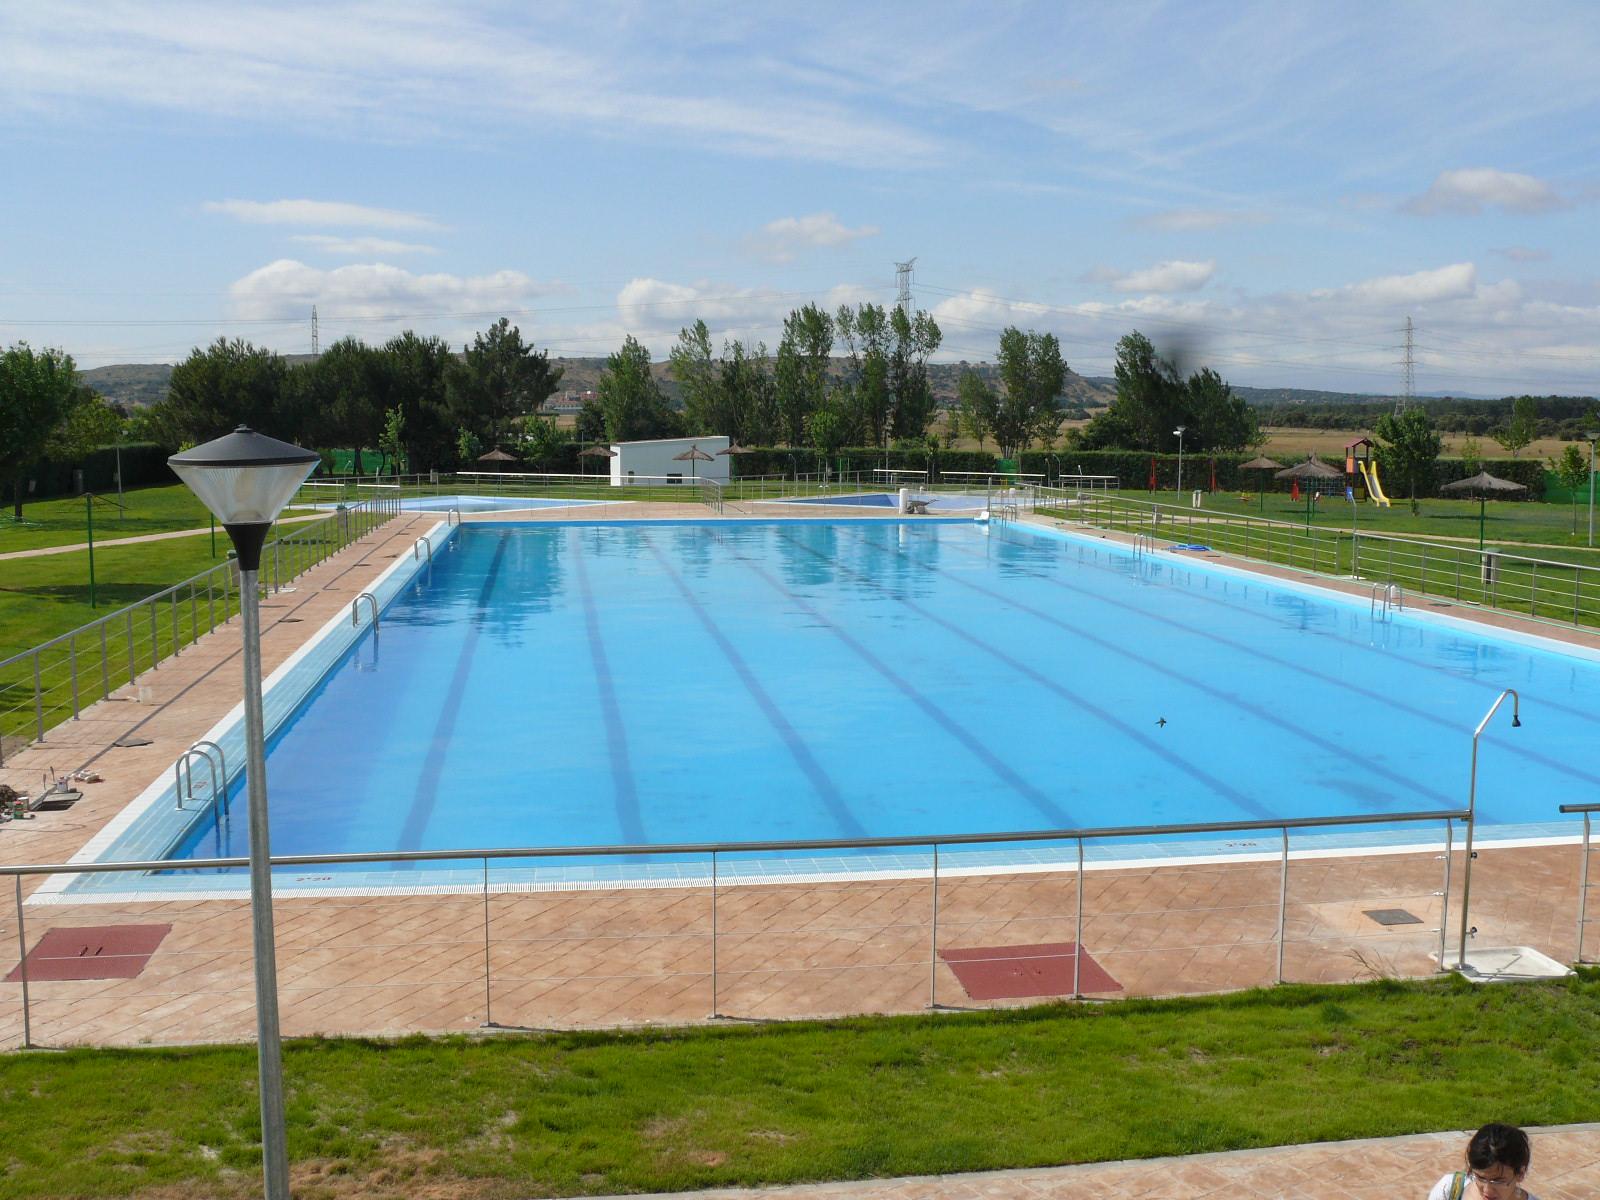 El viernes se abre al p blico la piscina municipal for Piscina municipal caceres